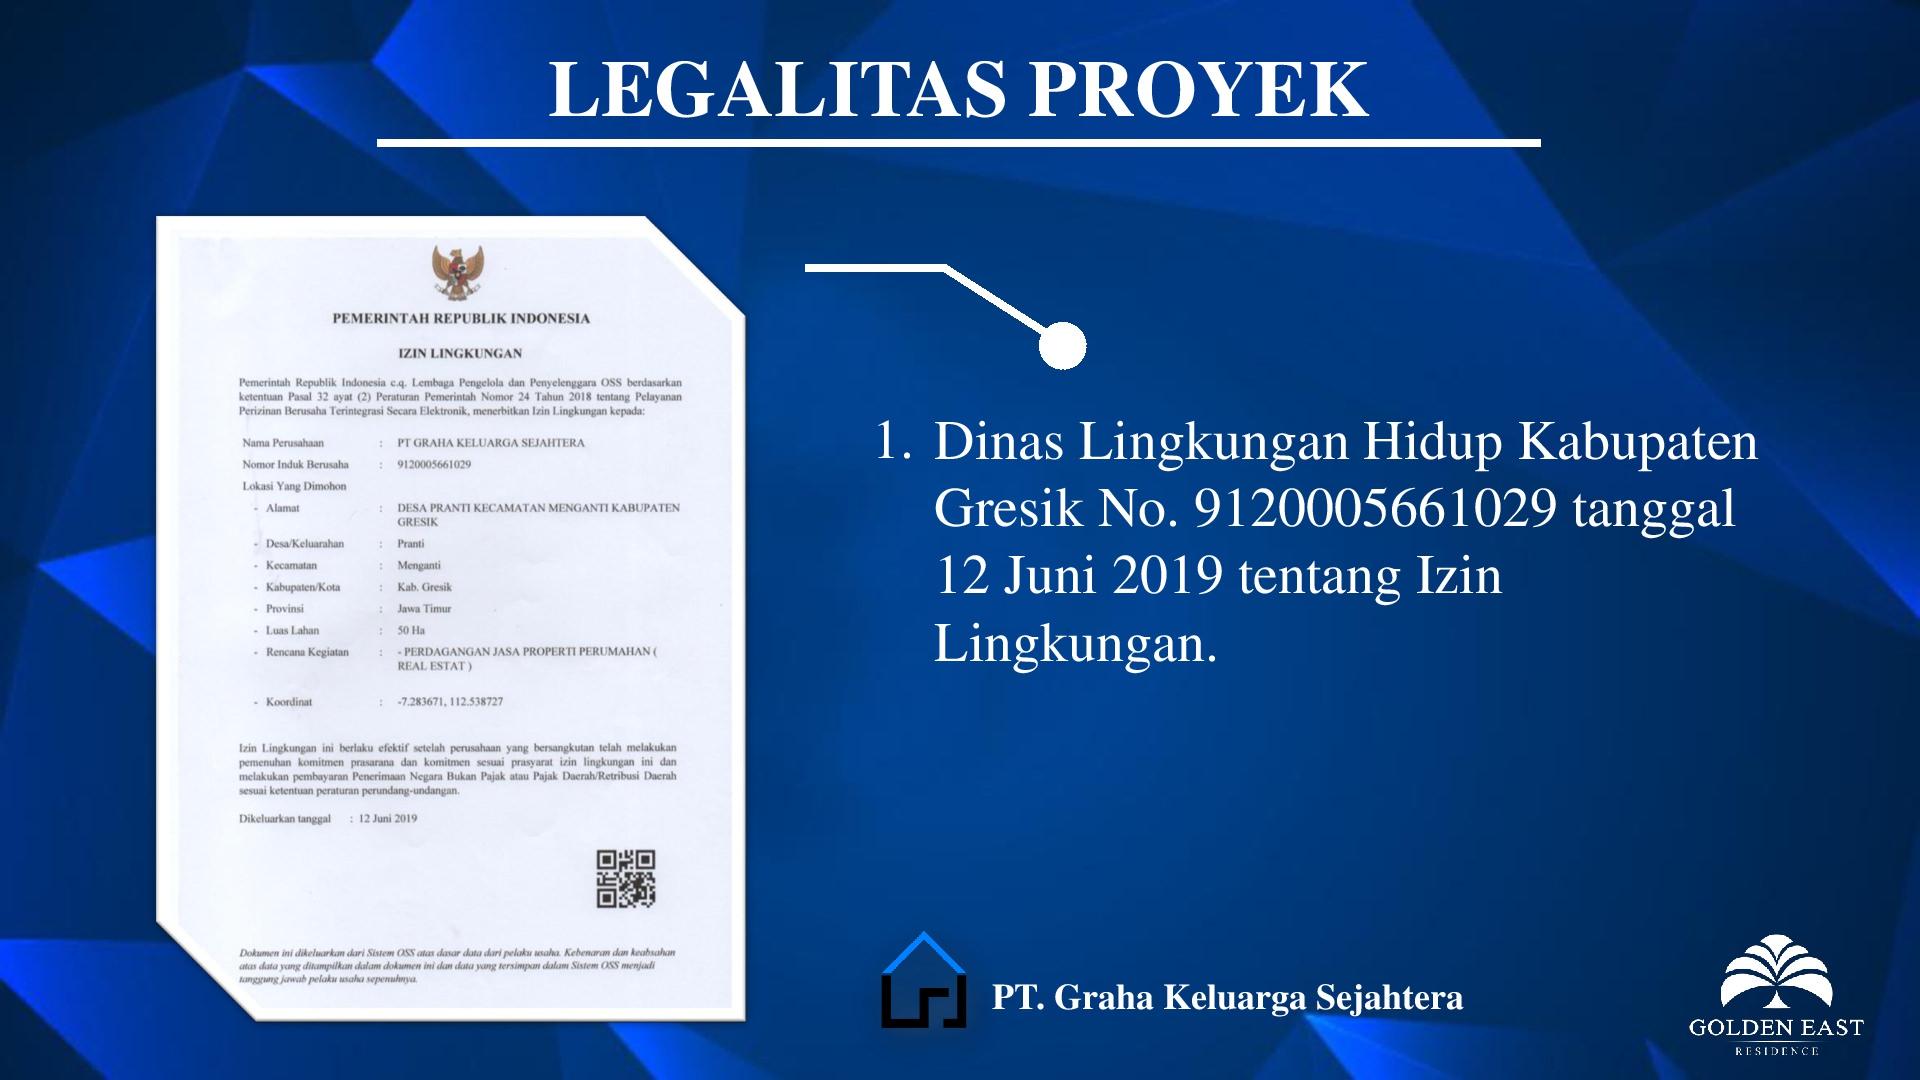 Golden East Residence Menganti Legalitas Proyek